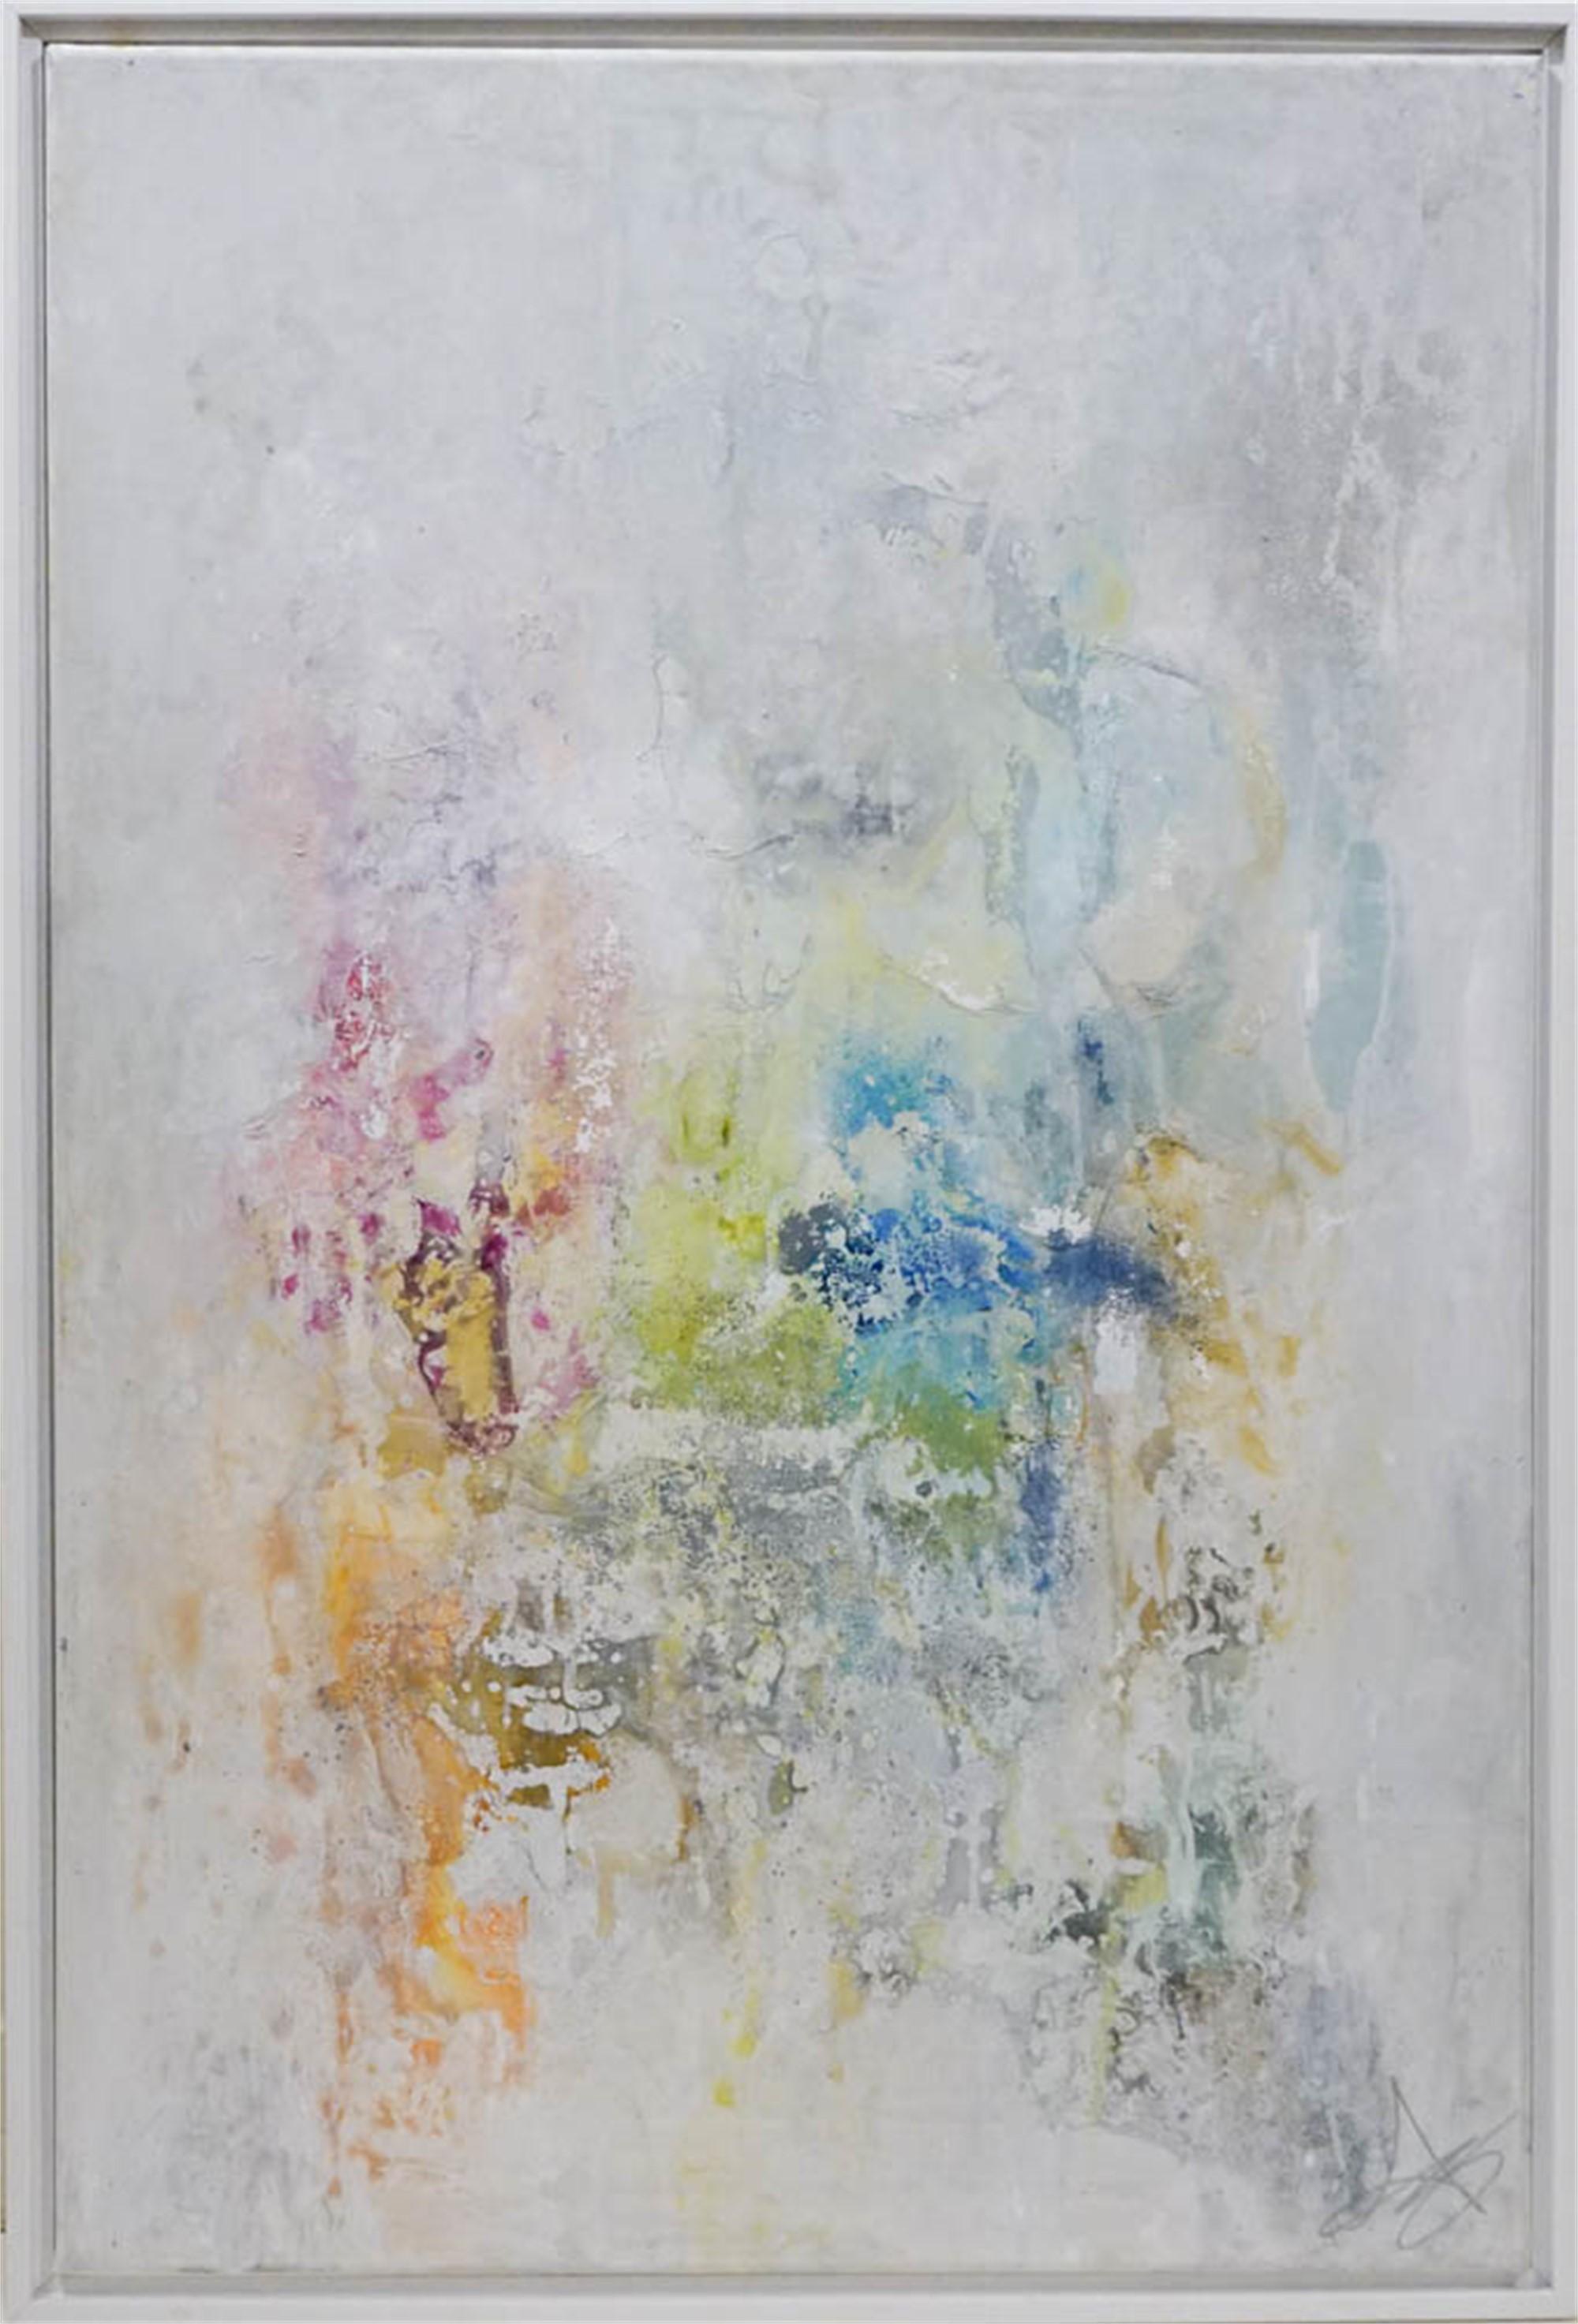 Take It To The Limet by Amy Gordon